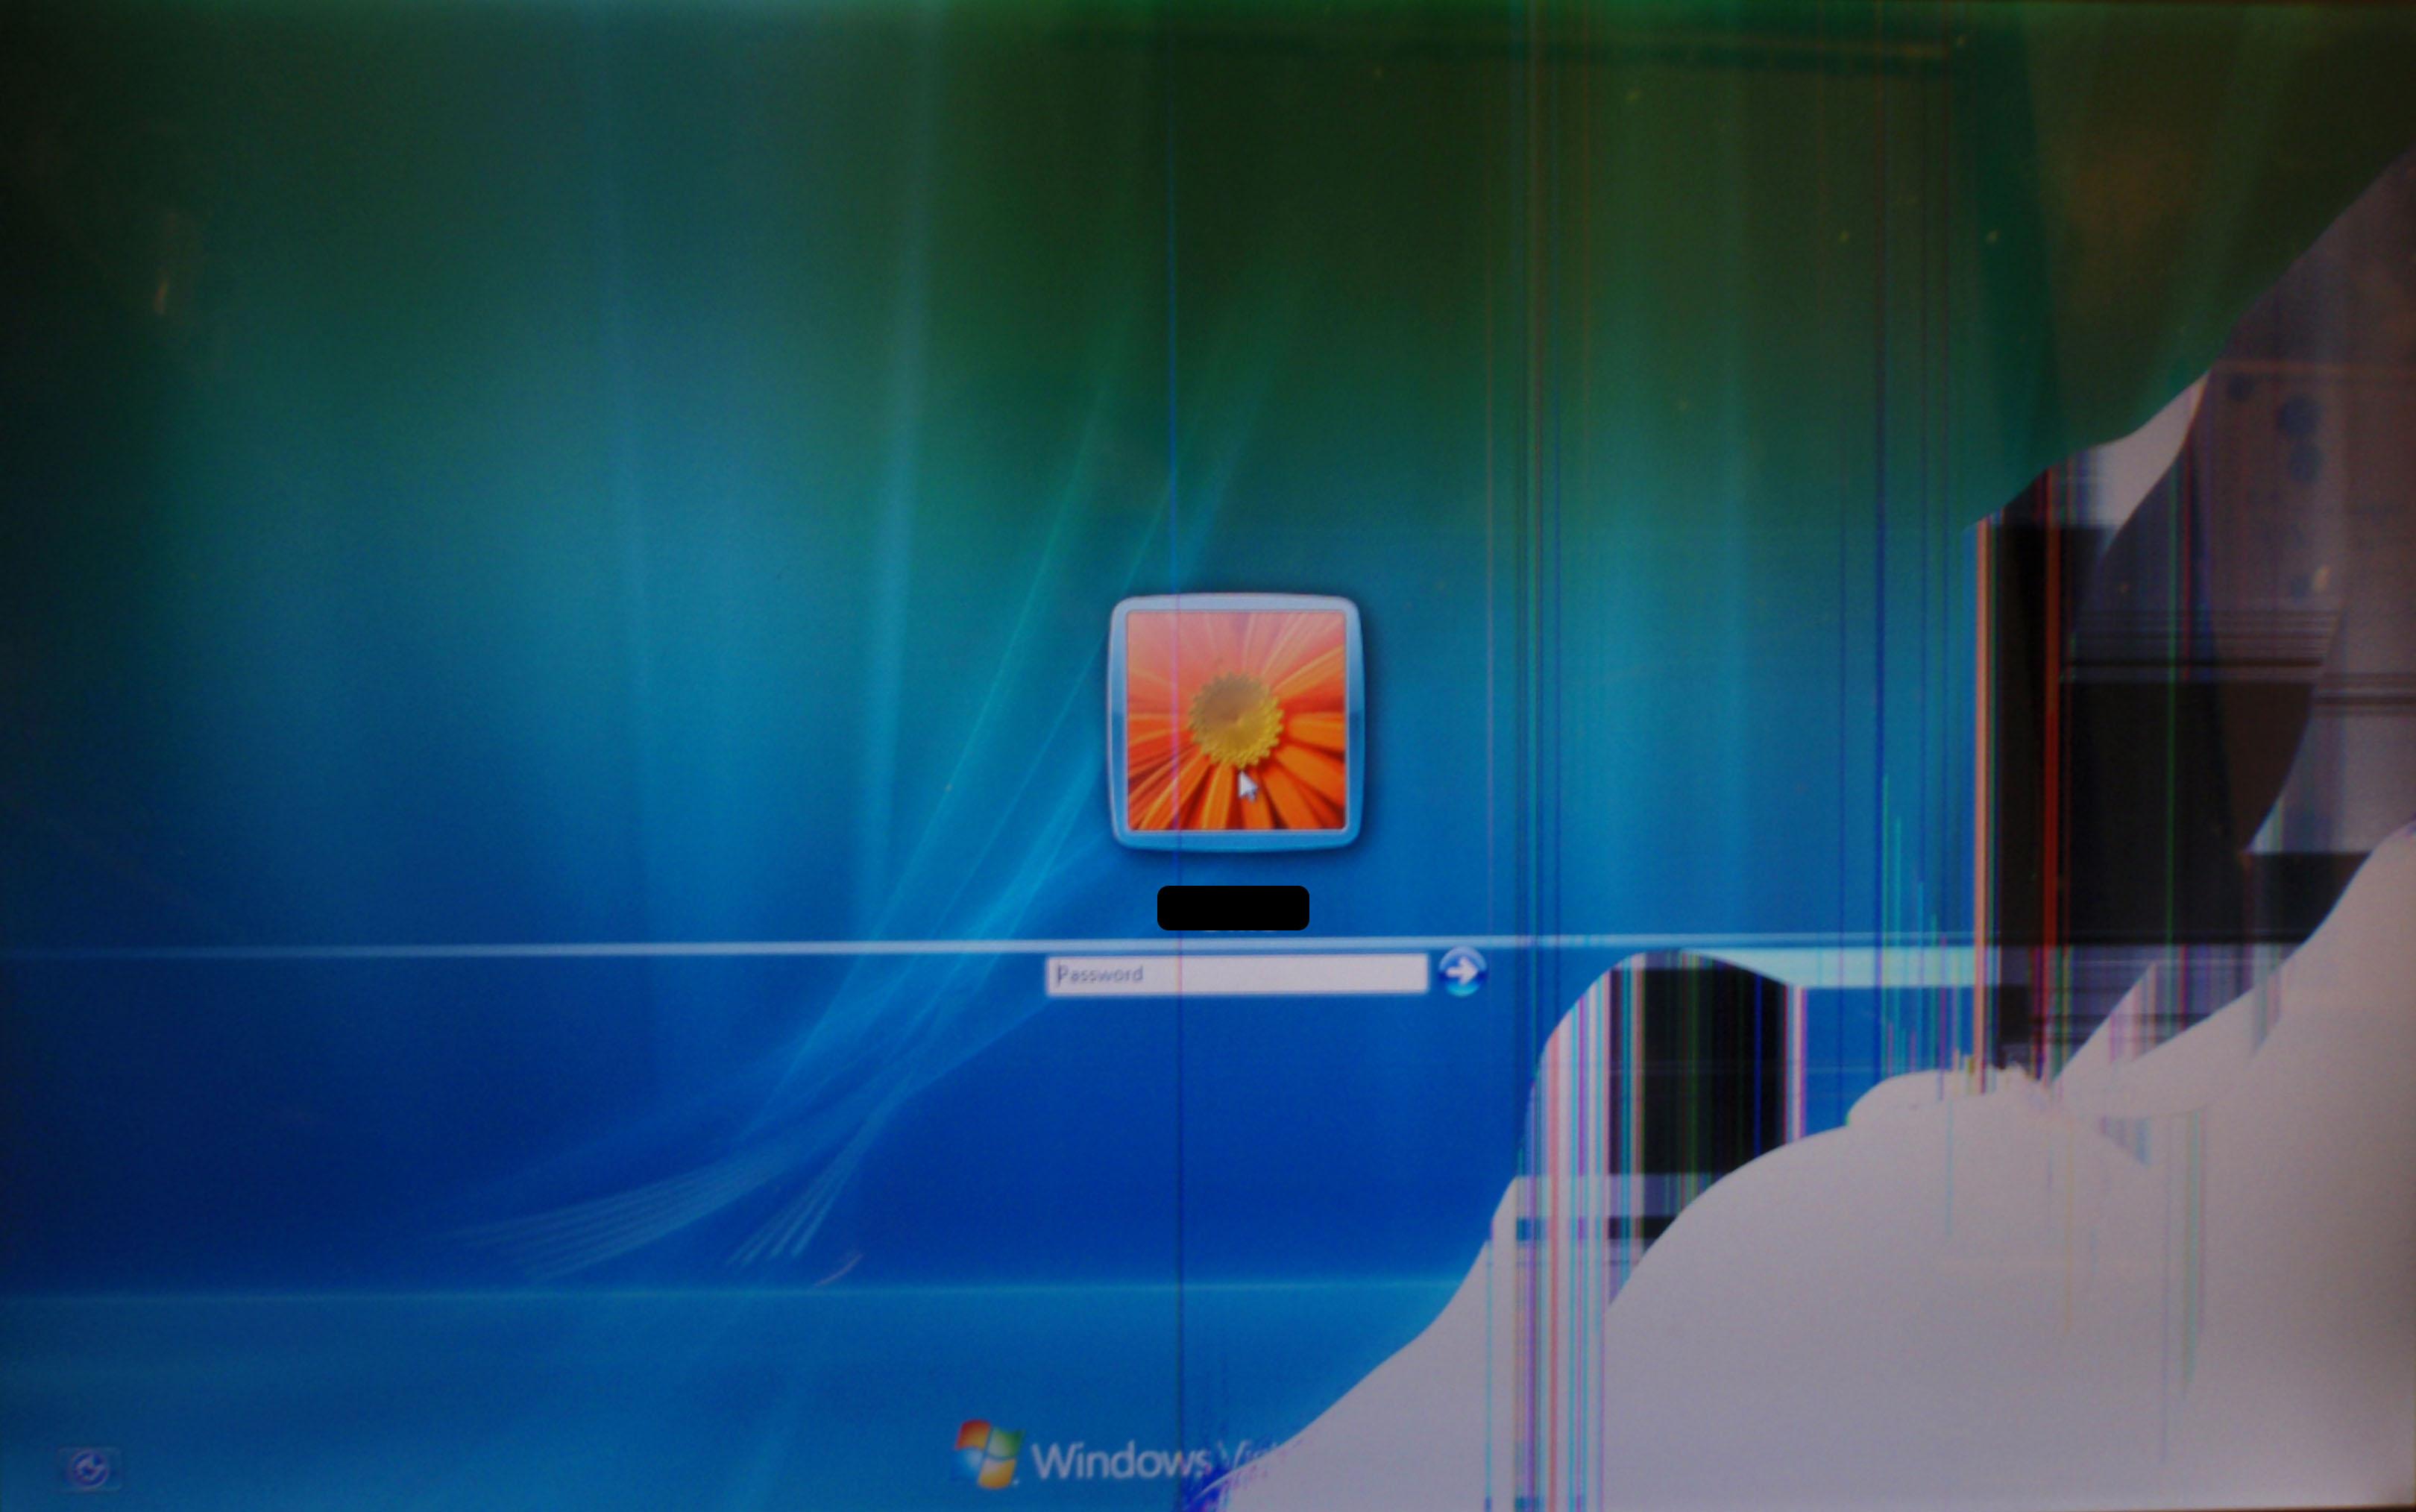 Subscribe Share Save Share TechnoSamrat Subscribe to TechnoSamrat 3240x2028